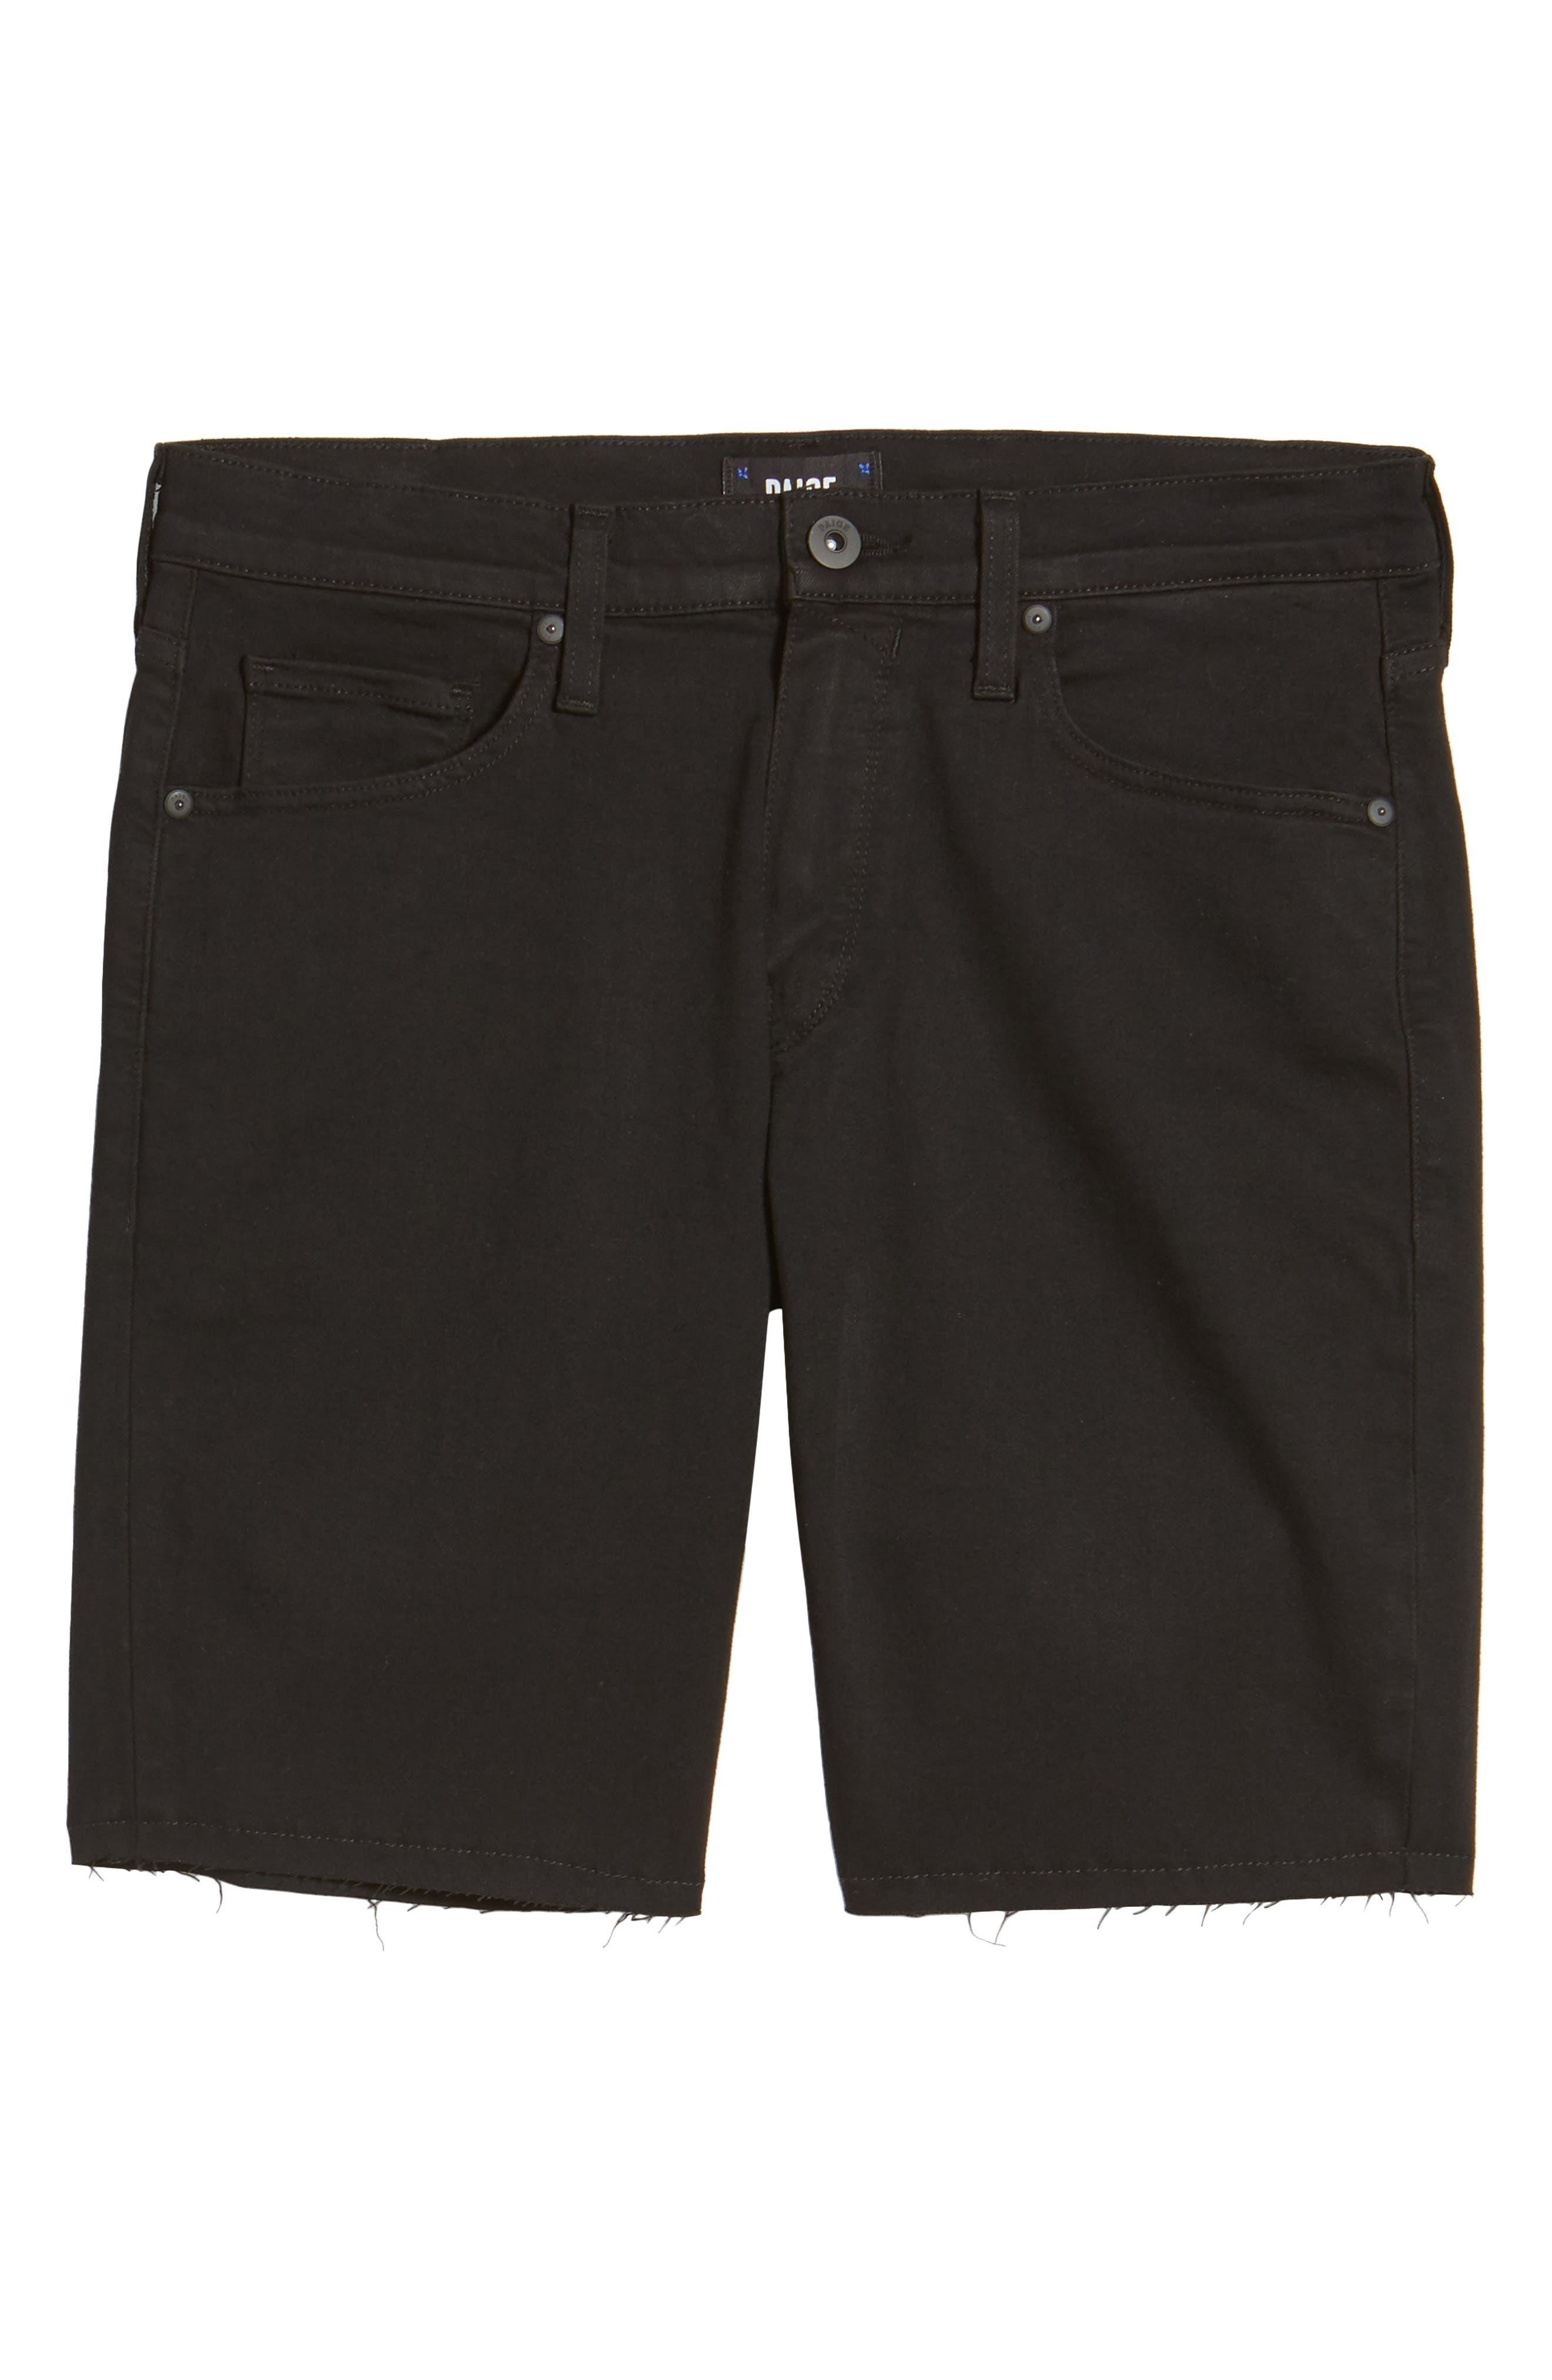 Transcend - Federal Slim Straight Leg Denim Shorts,                             Alternate thumbnail 6, color,                             001